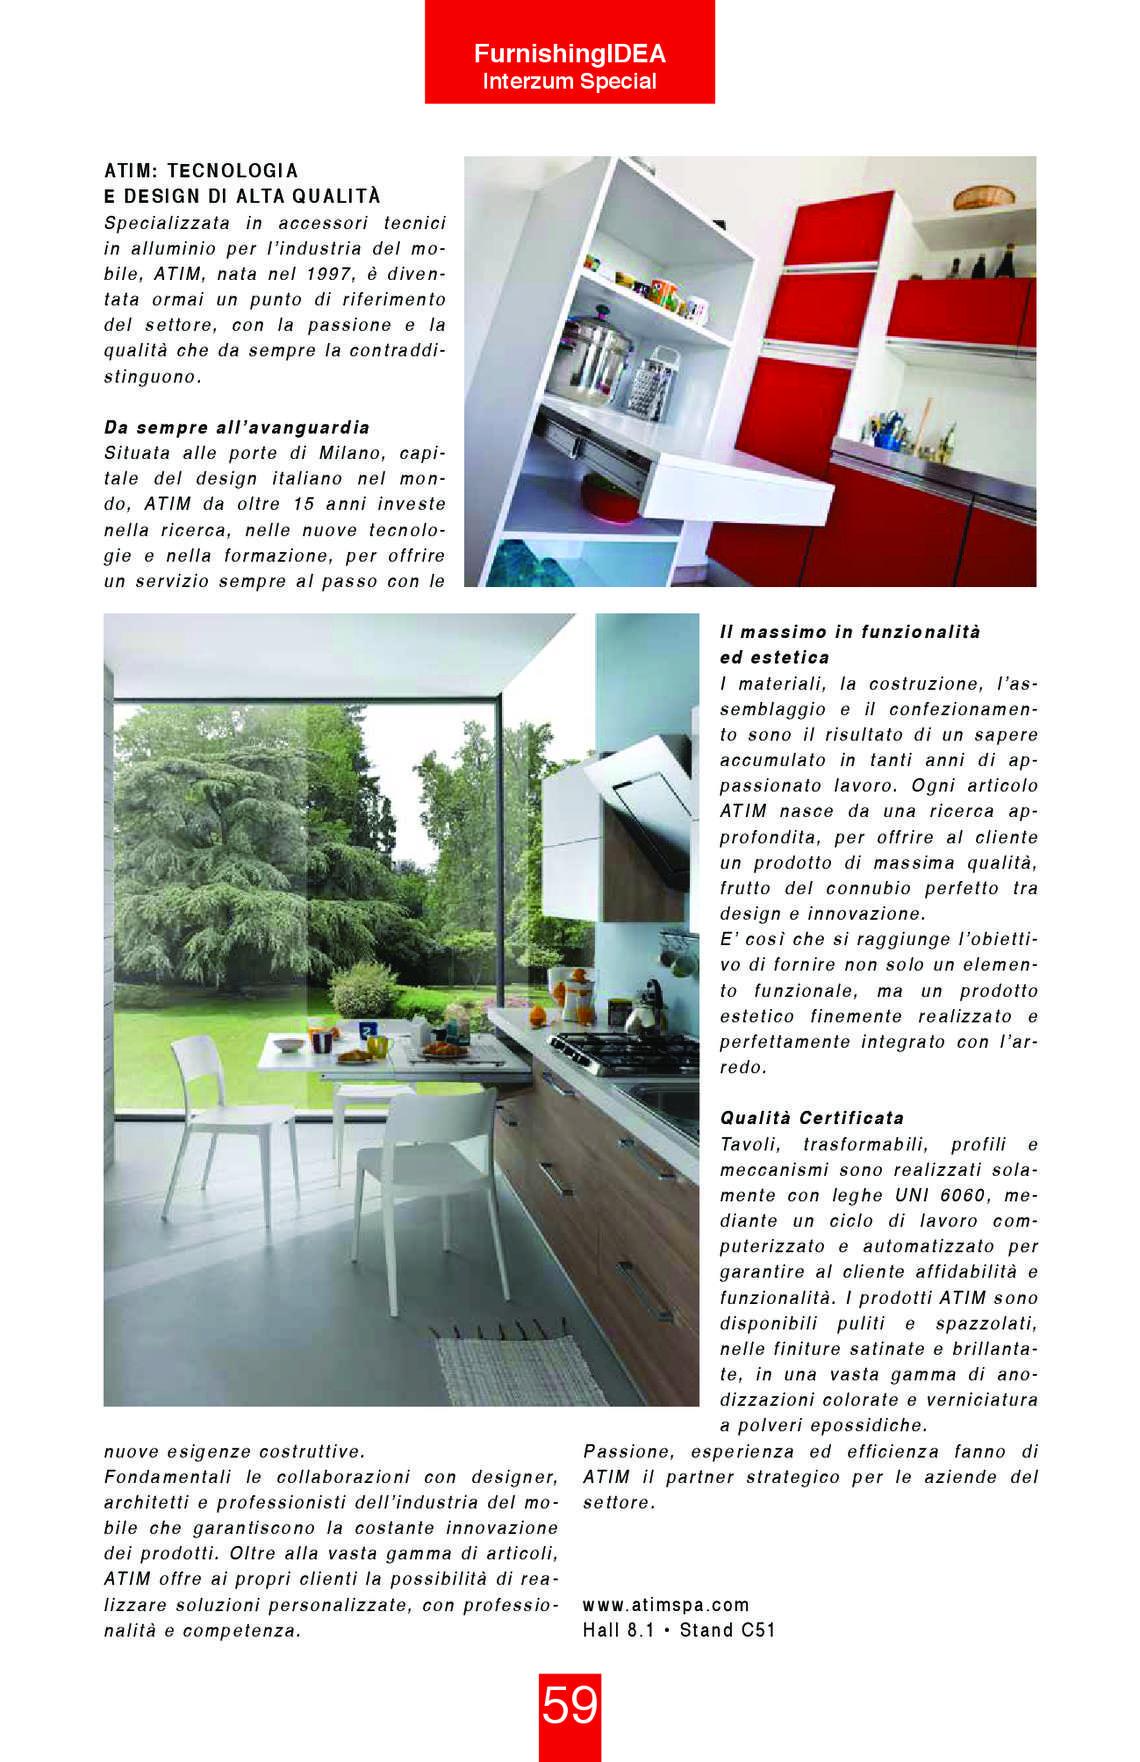 interzum-2015_journal_0_058.jpg